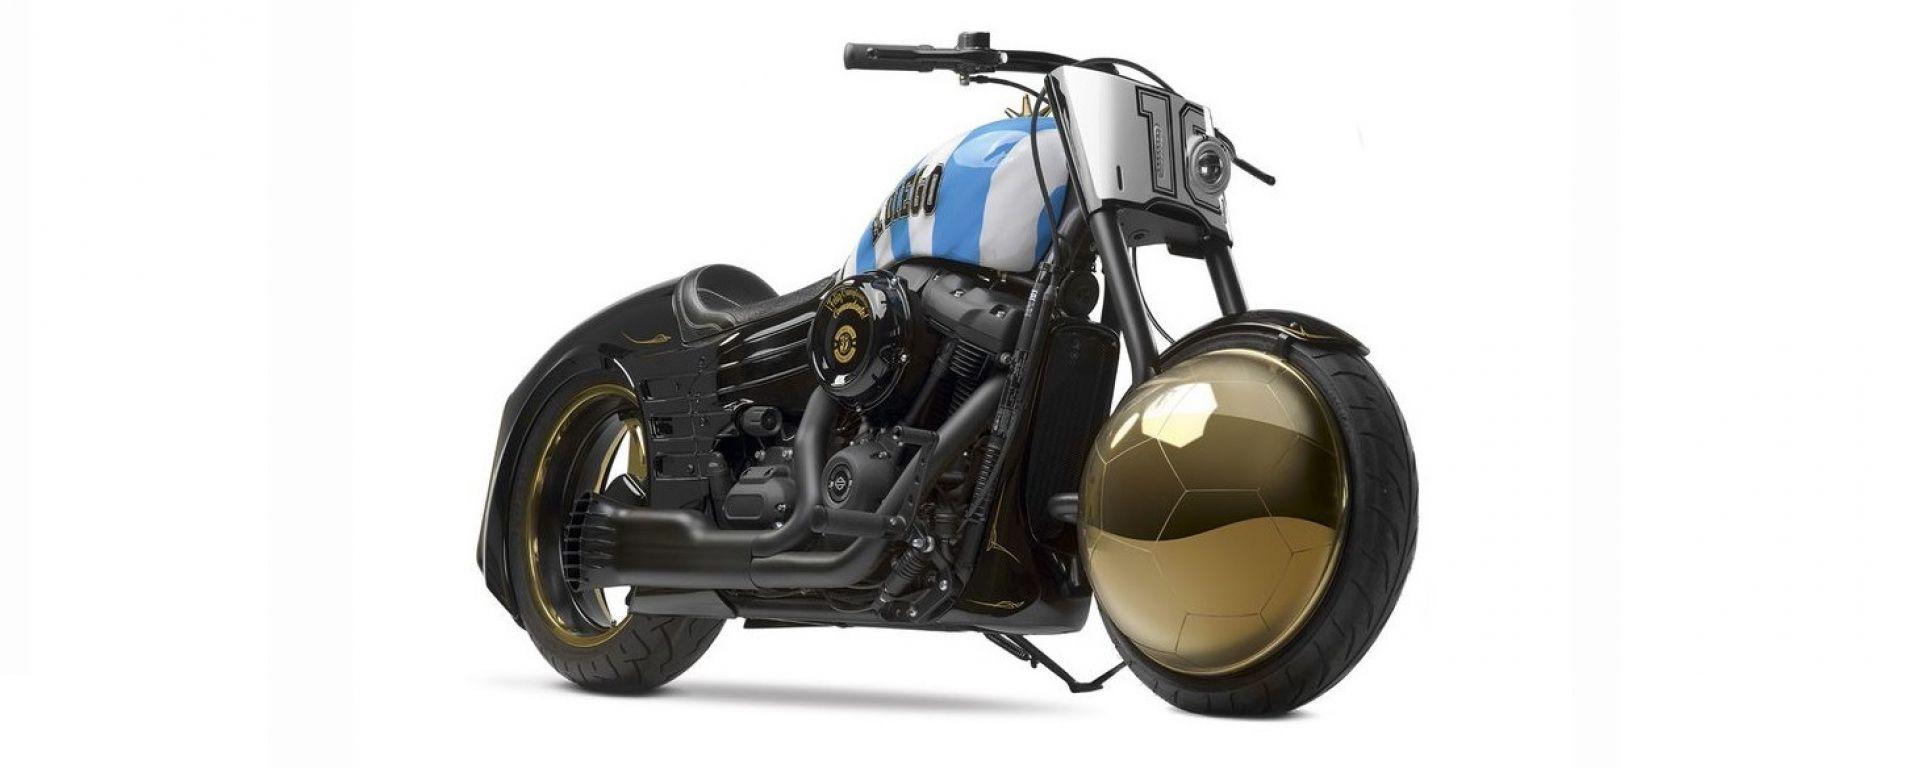 Harley-Davidson di Maradona